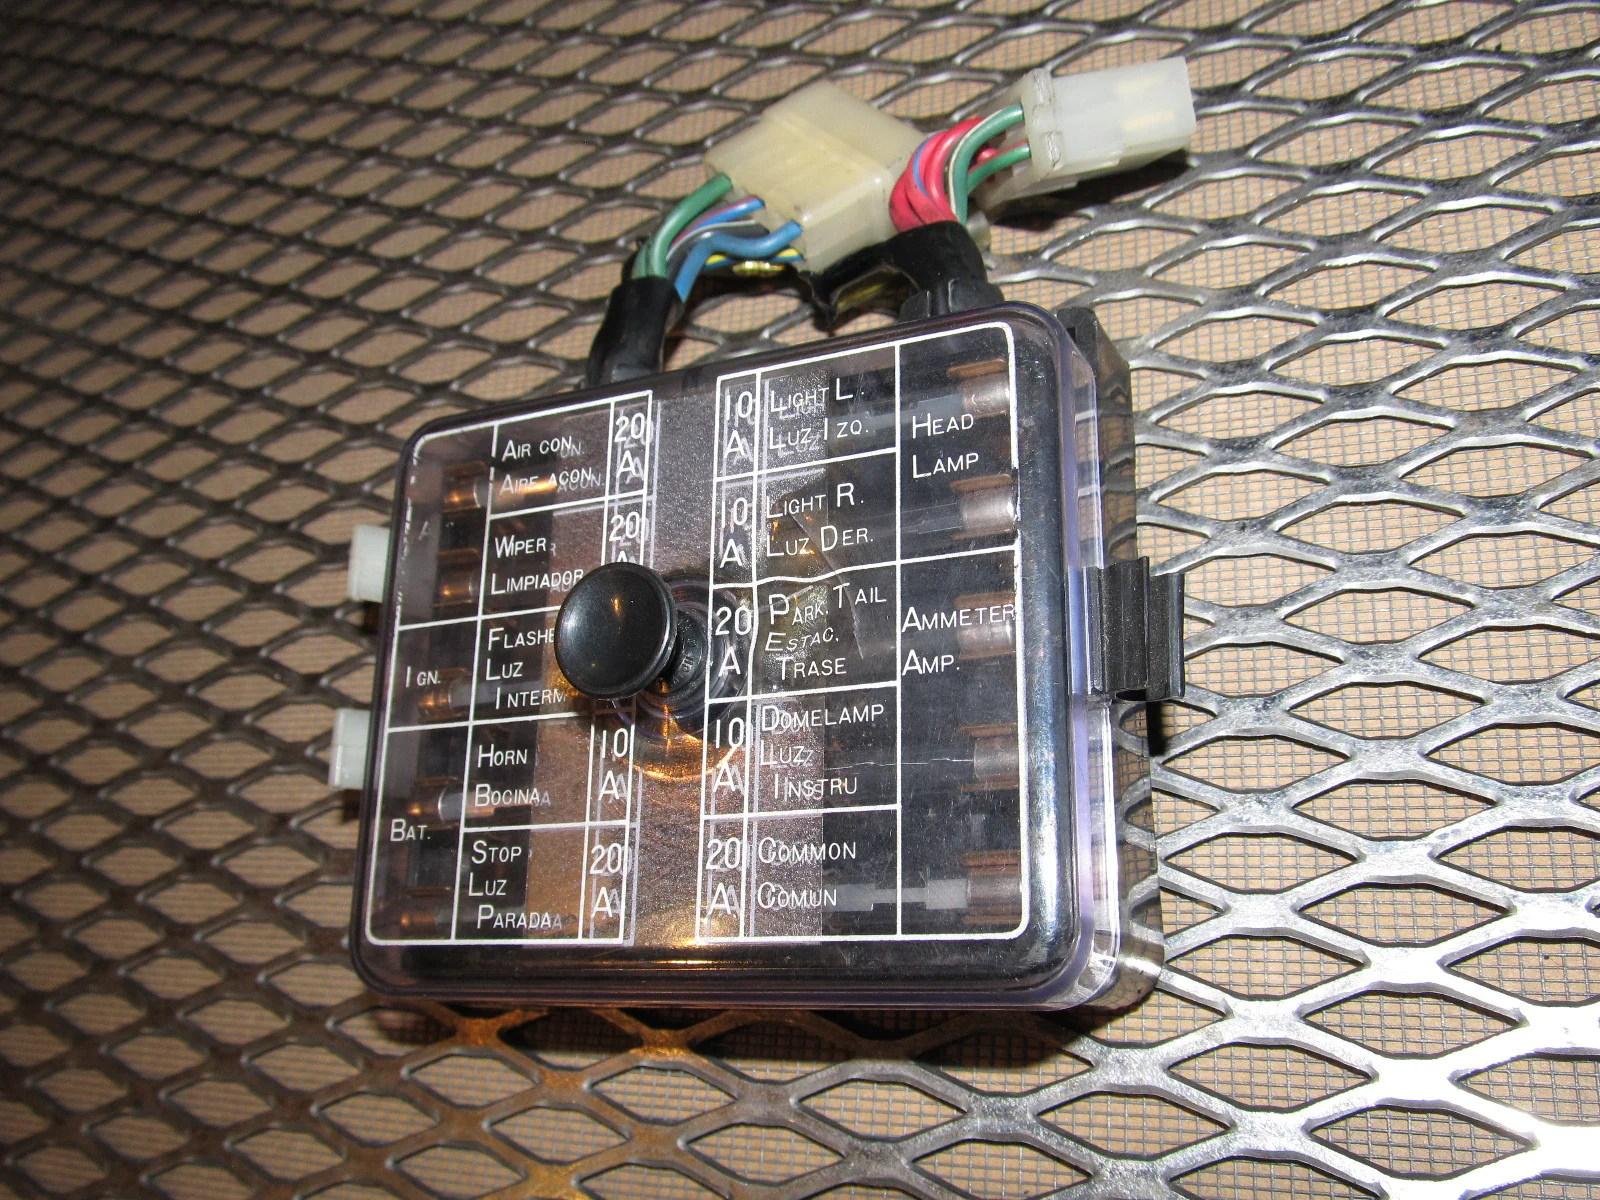 medium resolution of rx7 convertible fuse box 1988 mazda rx 7 convertible parts 1990 mazda rx7 fuse box diagram